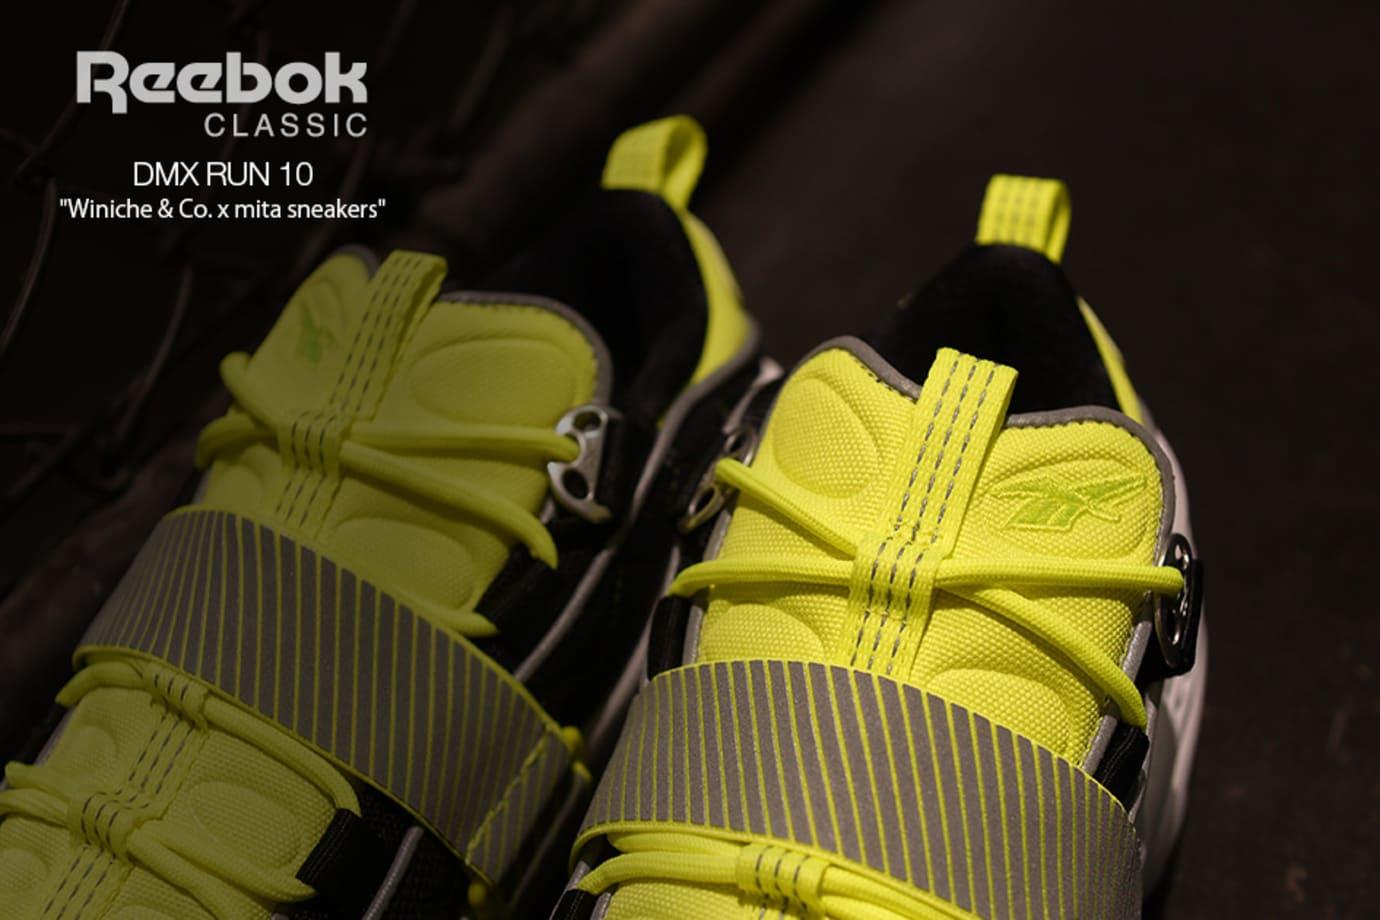 Winiche & Co x Mita Sneakers x Reebok DMX Run 10 (Tongue)